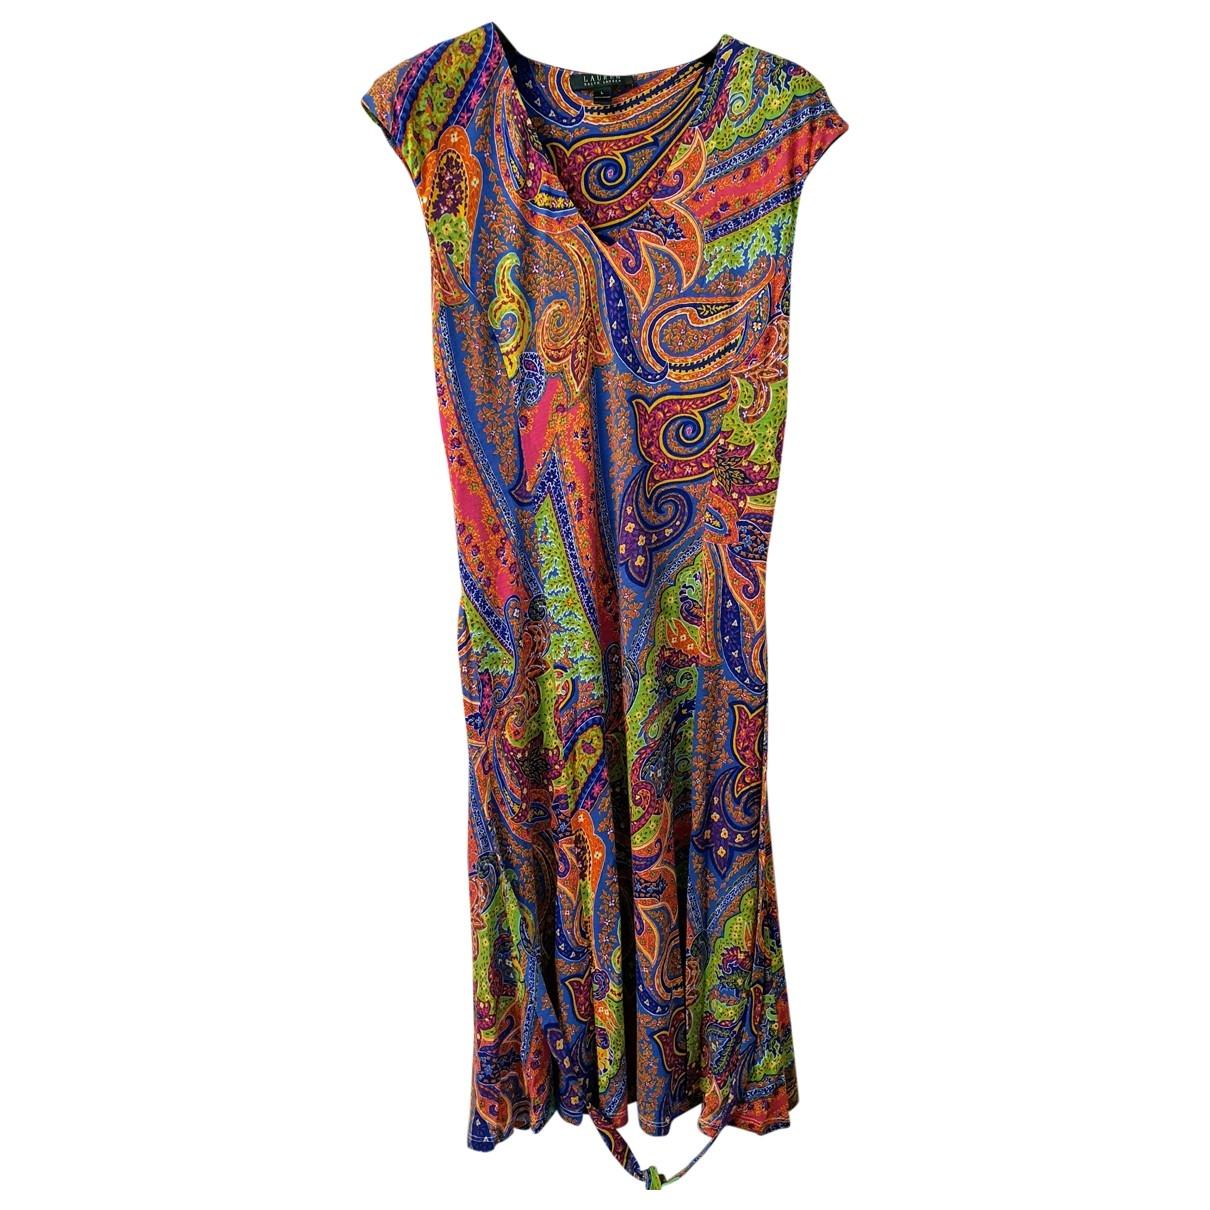 Lauren Ralph Lauren - Robe   pour femme - multicolore